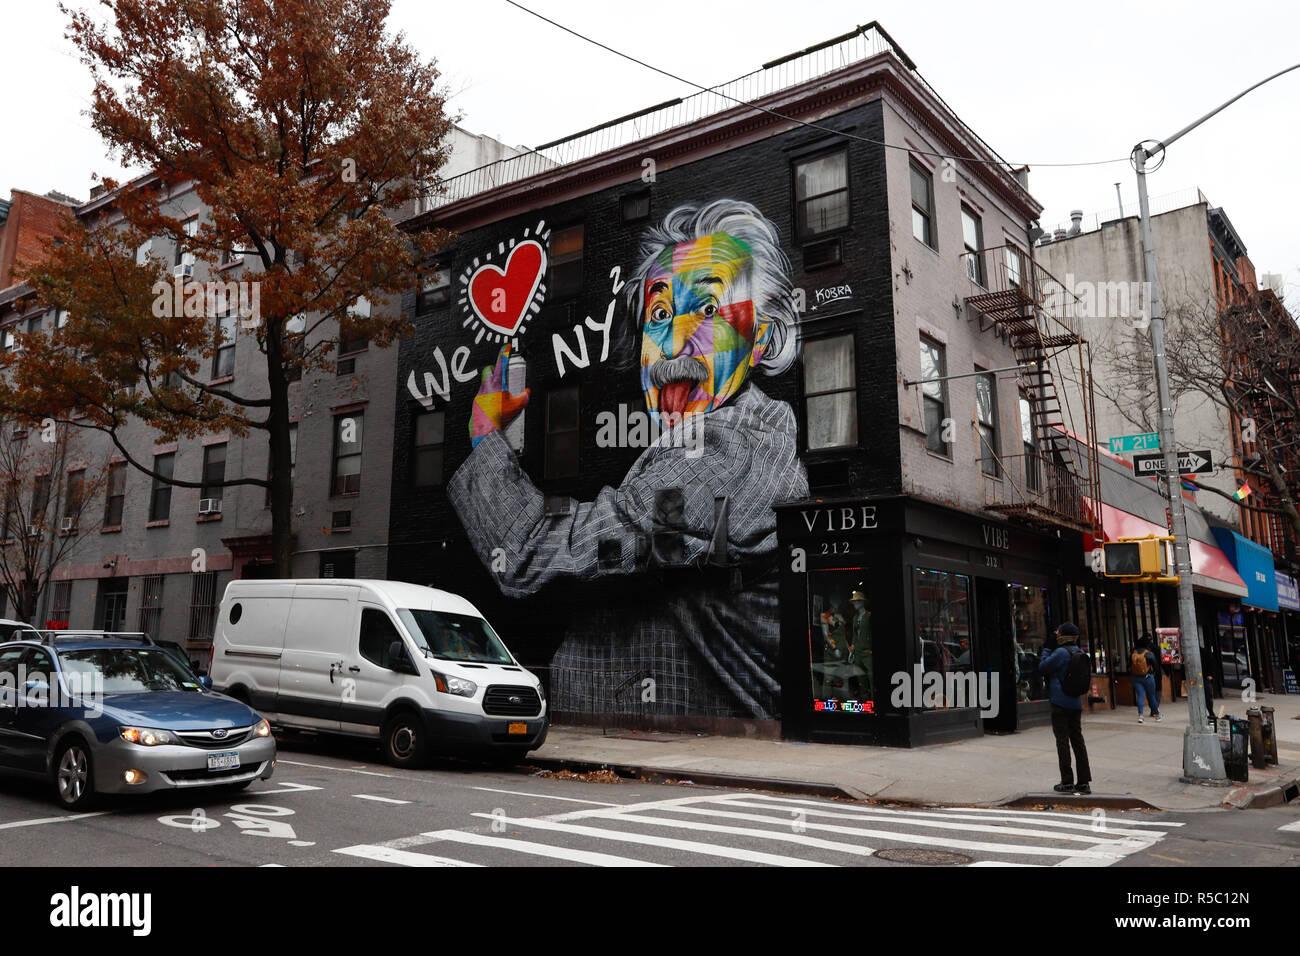 Wallach division of art, prints and photographs: Mural Of We Love New York With Albert Einstein S Portrait Is Seen In Manhattan New York Artwork By Brazilian Muralist Eduardo Kobra Photo Vanessa C Stock Photo Alamy